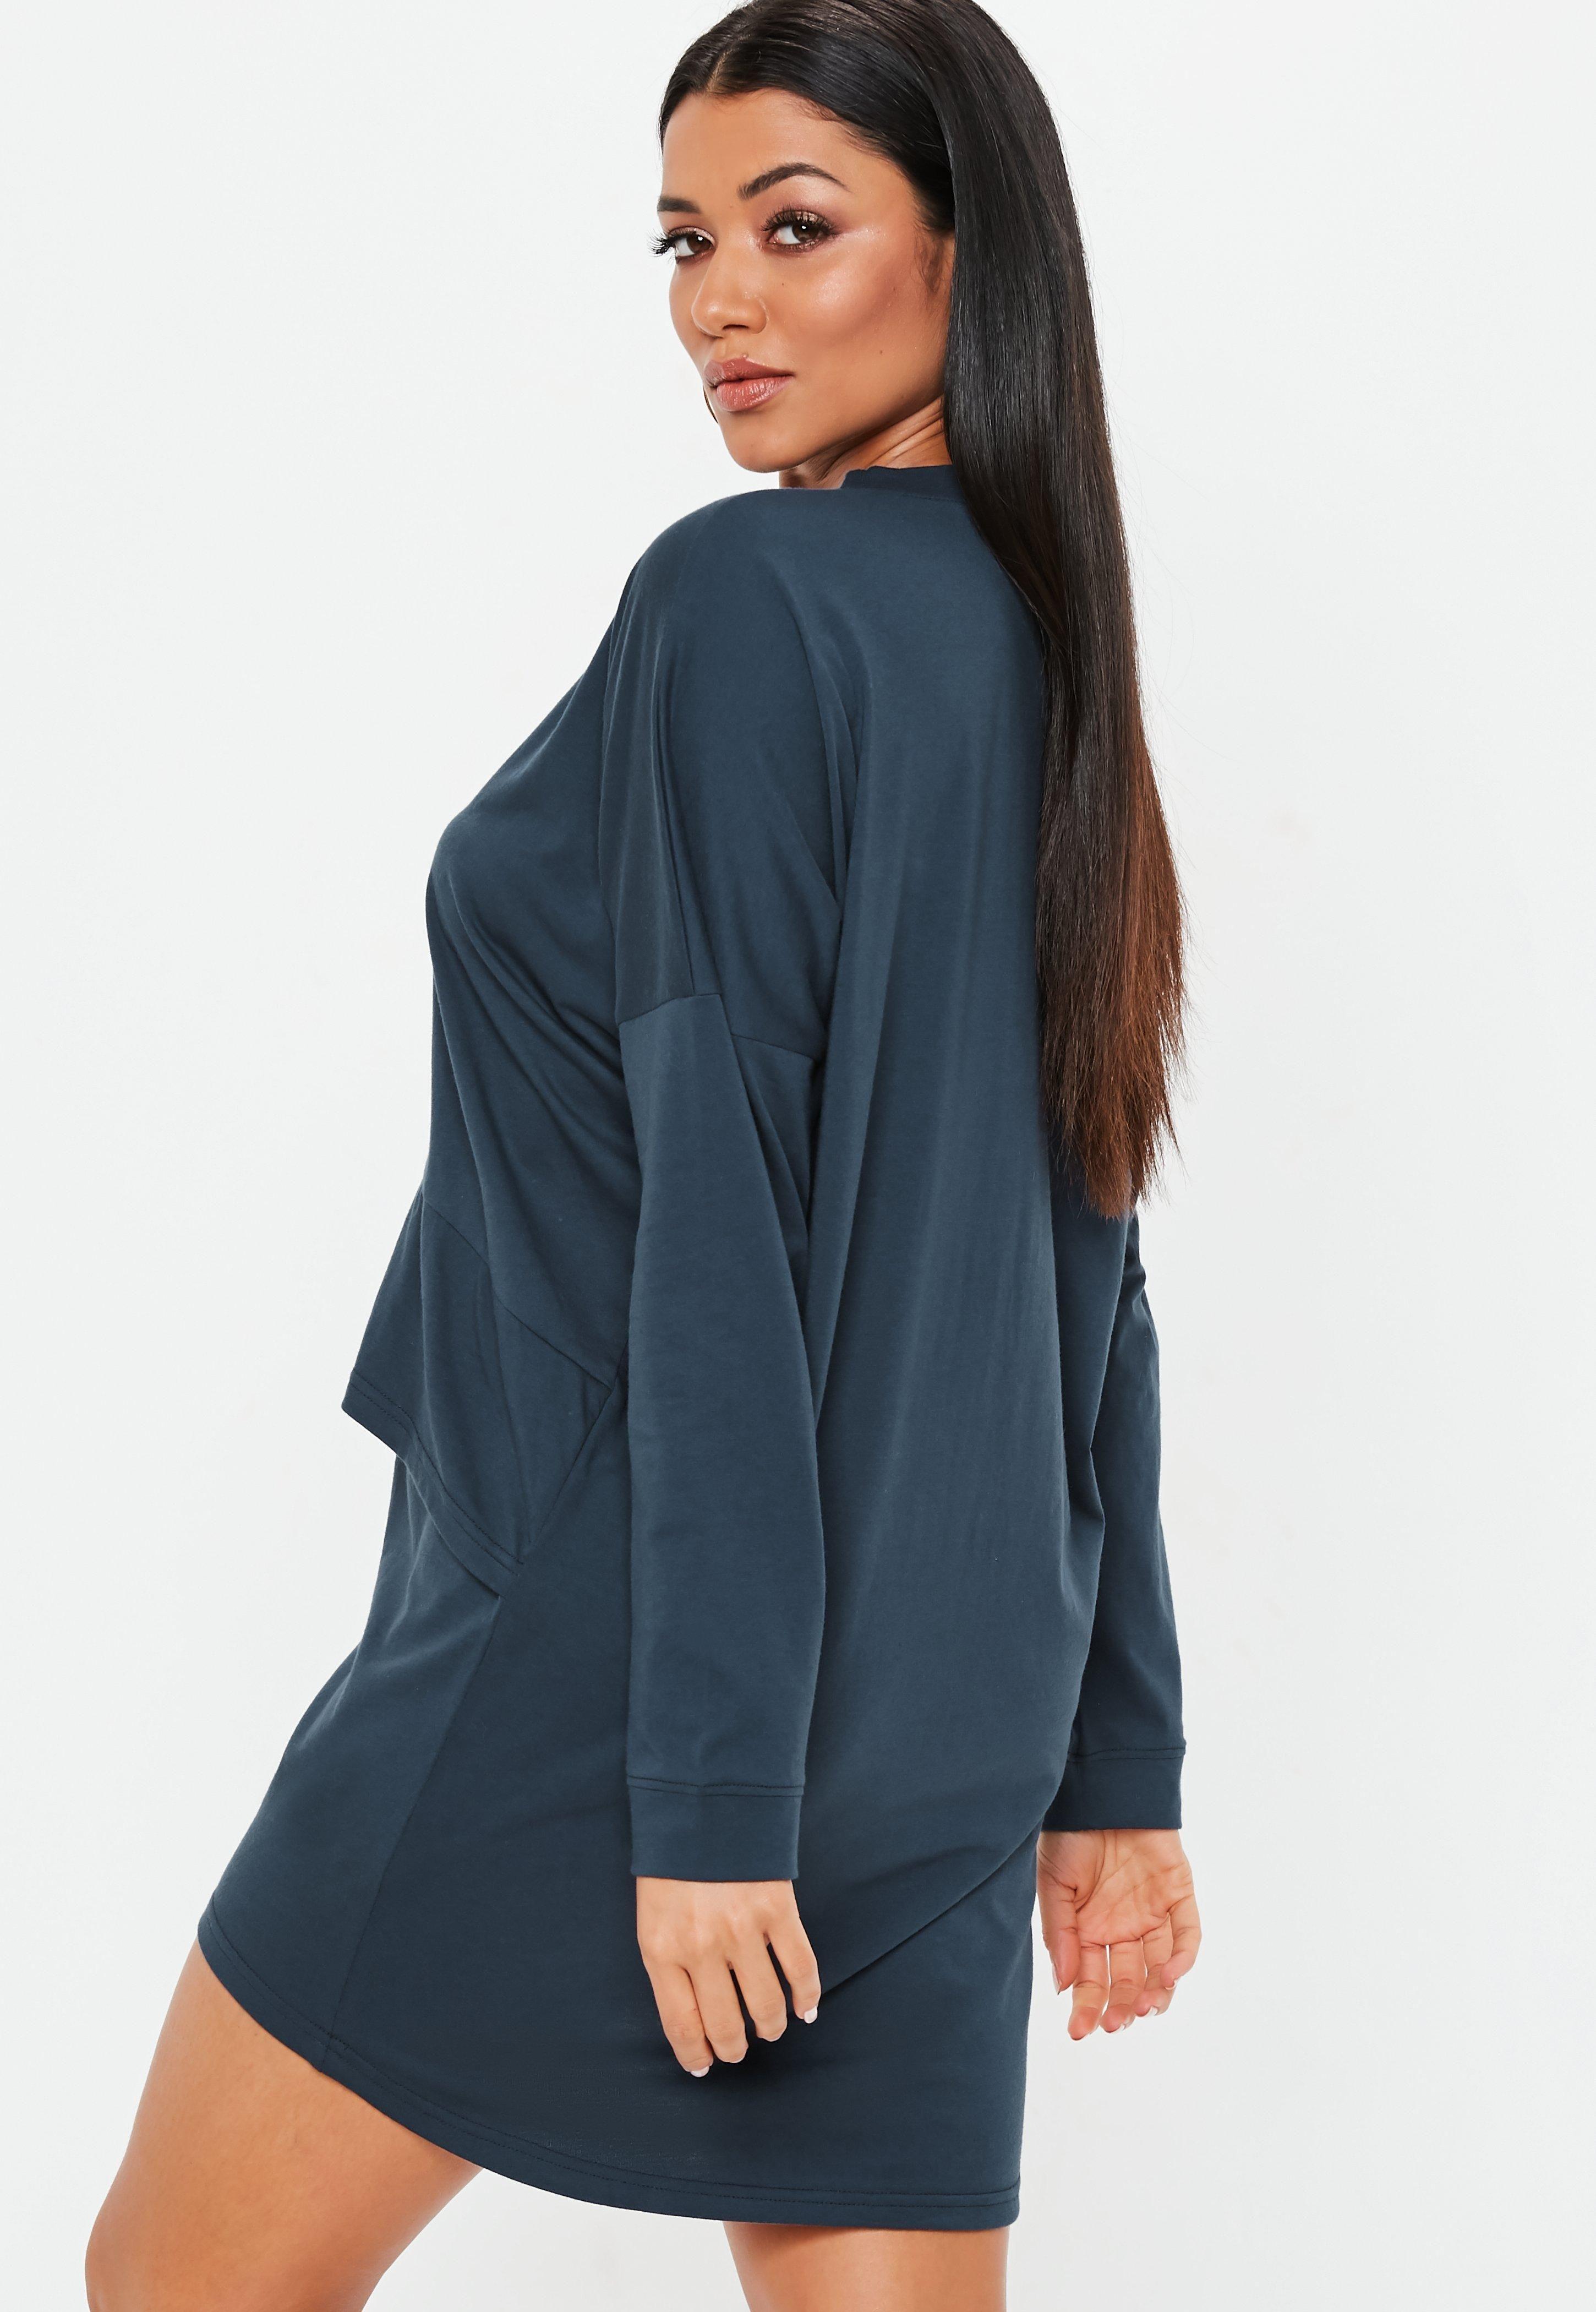 f7da6f2feba58 Navy Oversized Jersey Overlay T Shirt Dress #Sponsored #Jersey, #sponsored,  #Oversized, #Navy